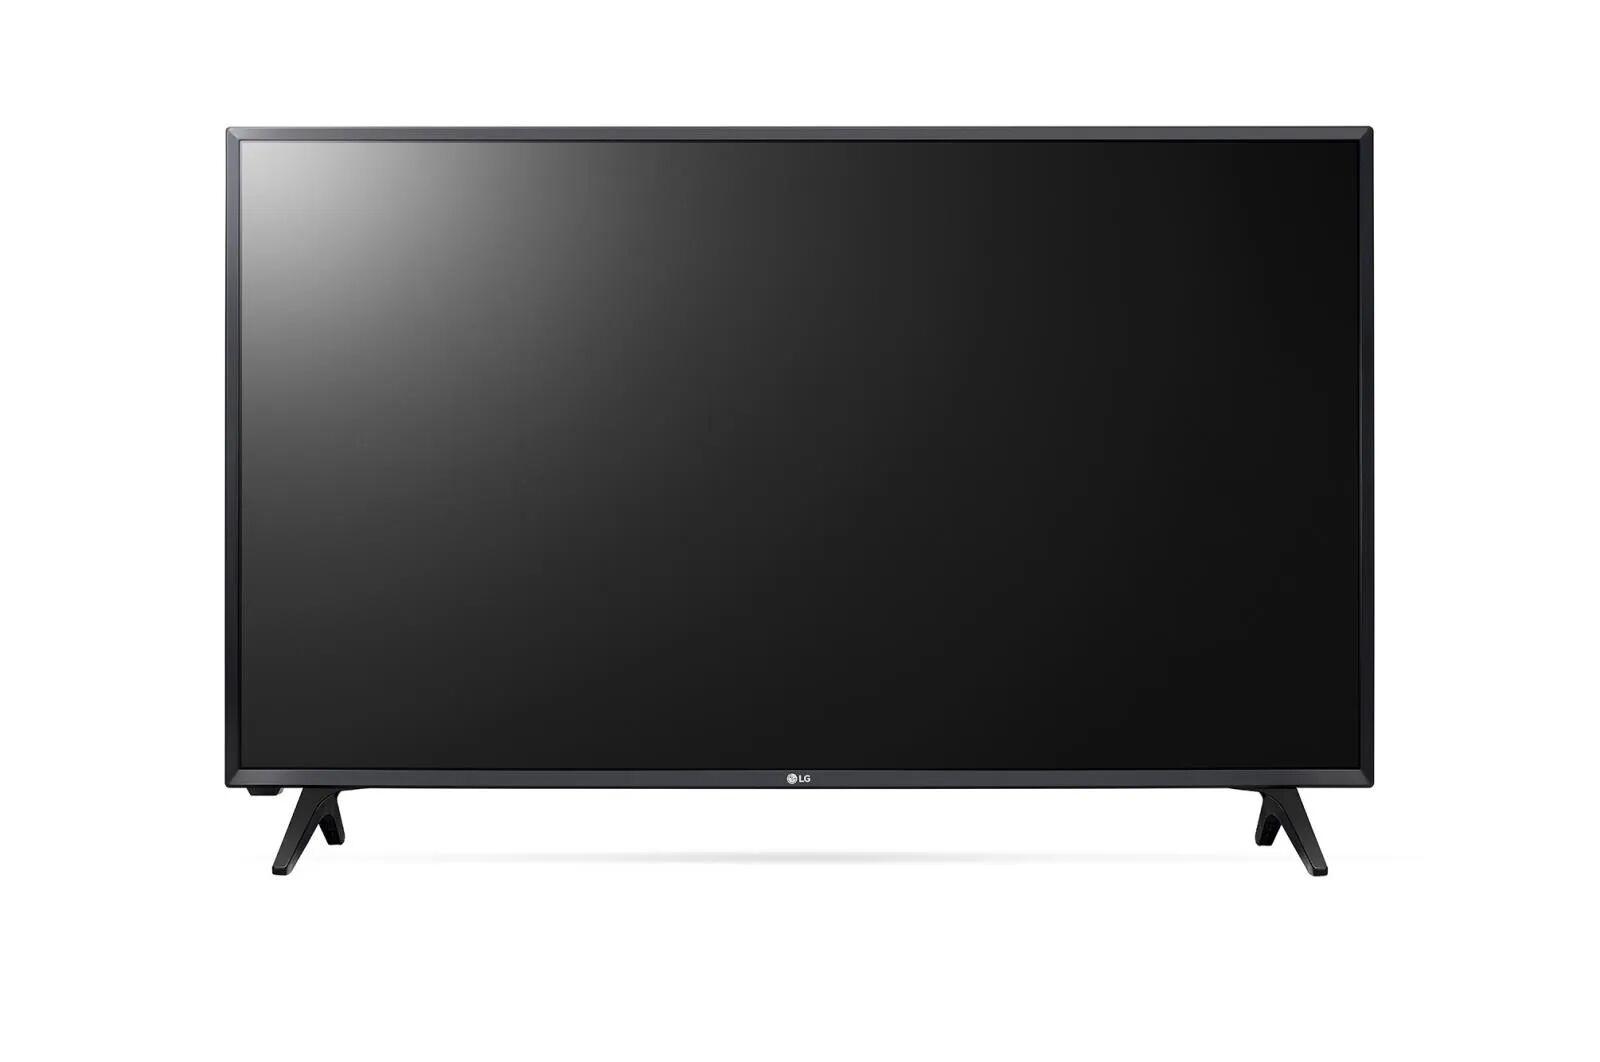 LG 43LK5000PLA Tv Led 43'' Full Hd Nero